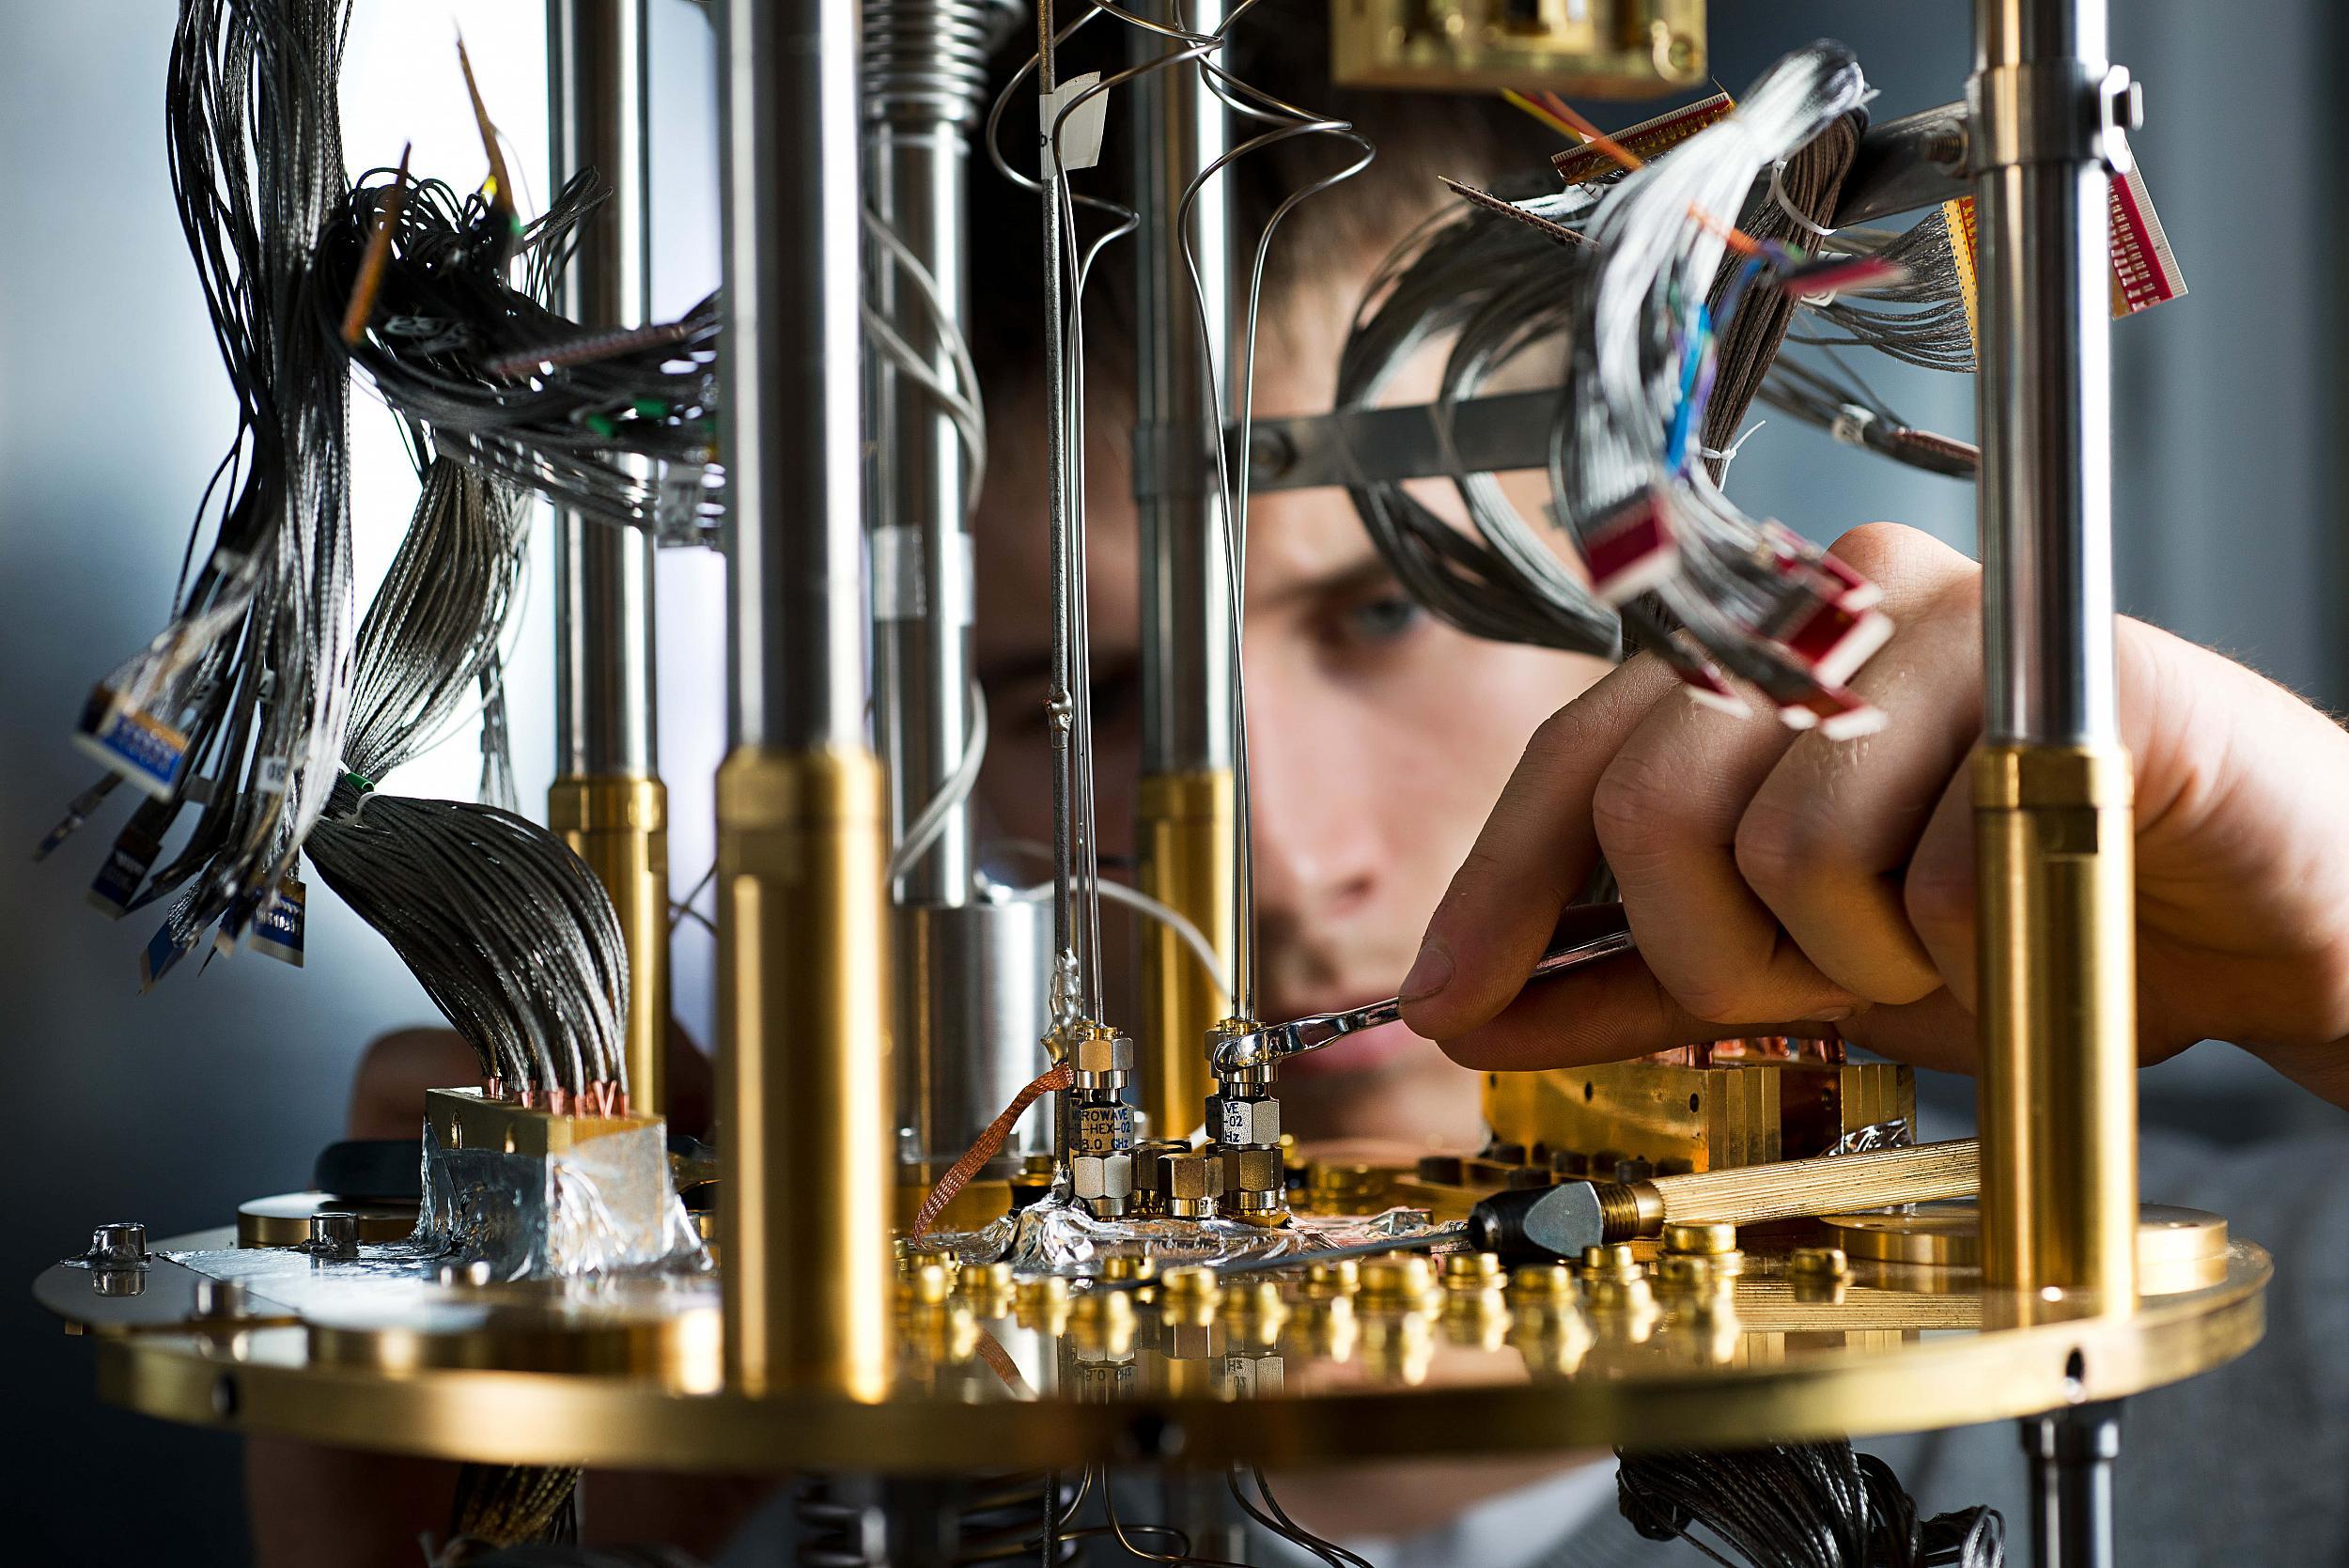 Quantencomputer | Companisto Blog